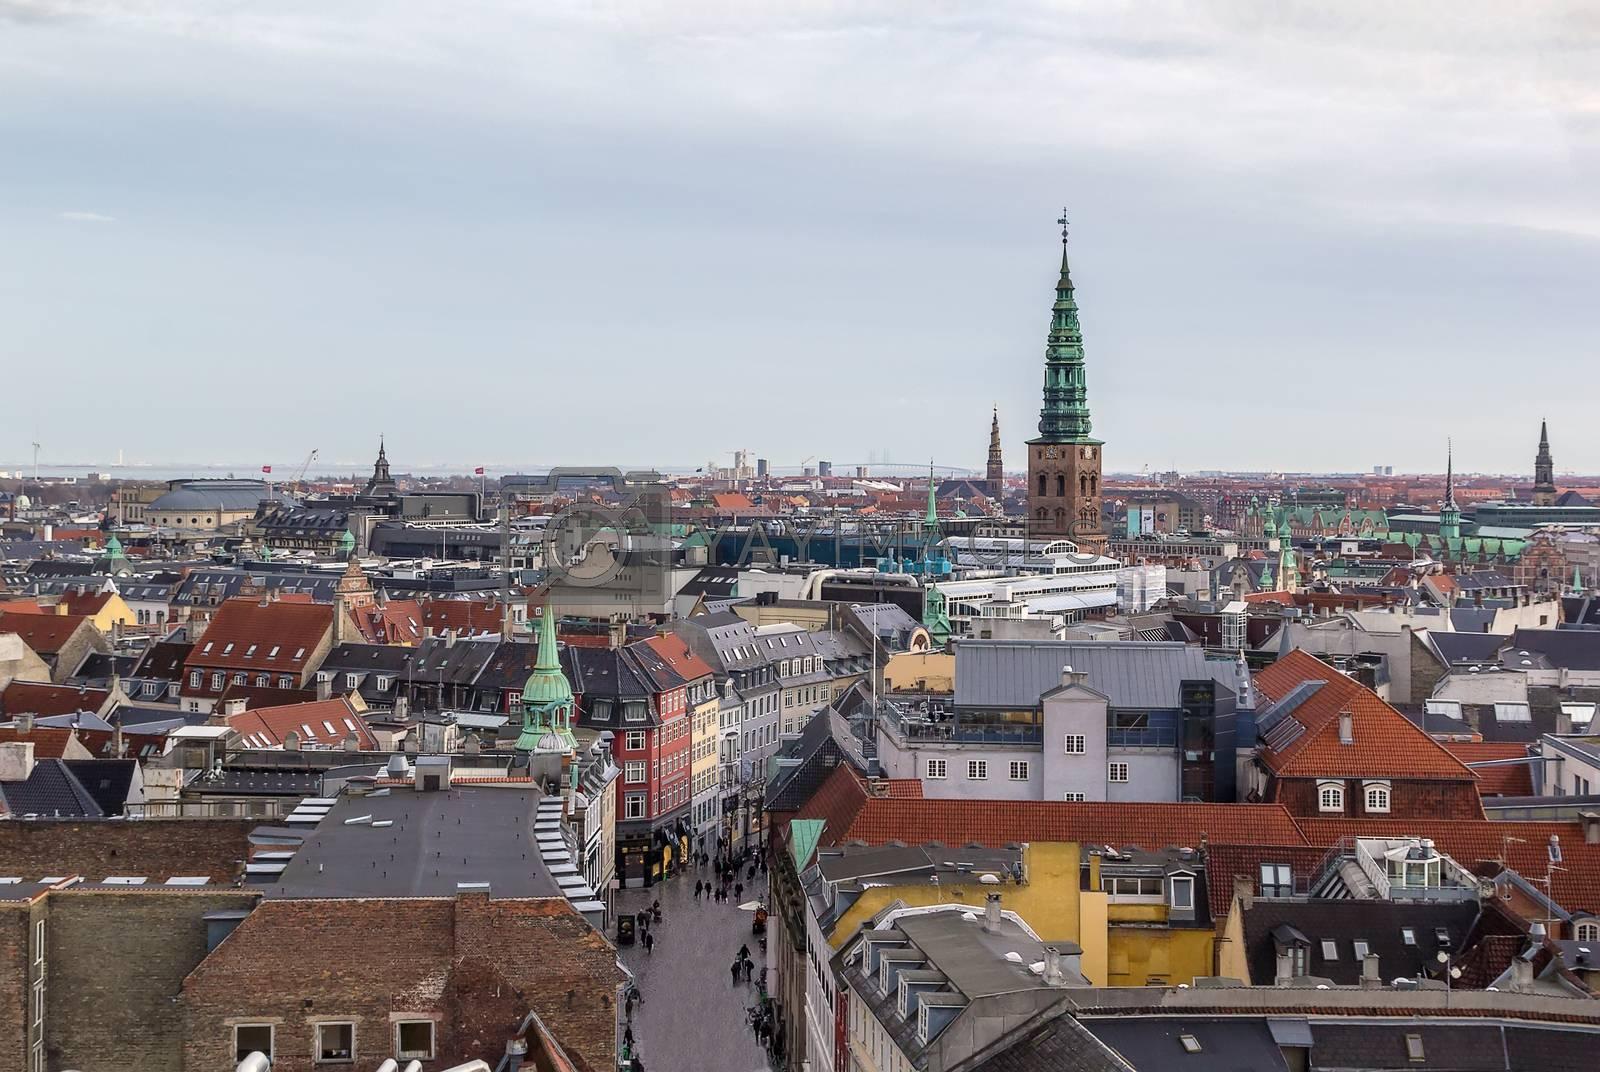 view of the Copenhagen, Denmark by borisb17